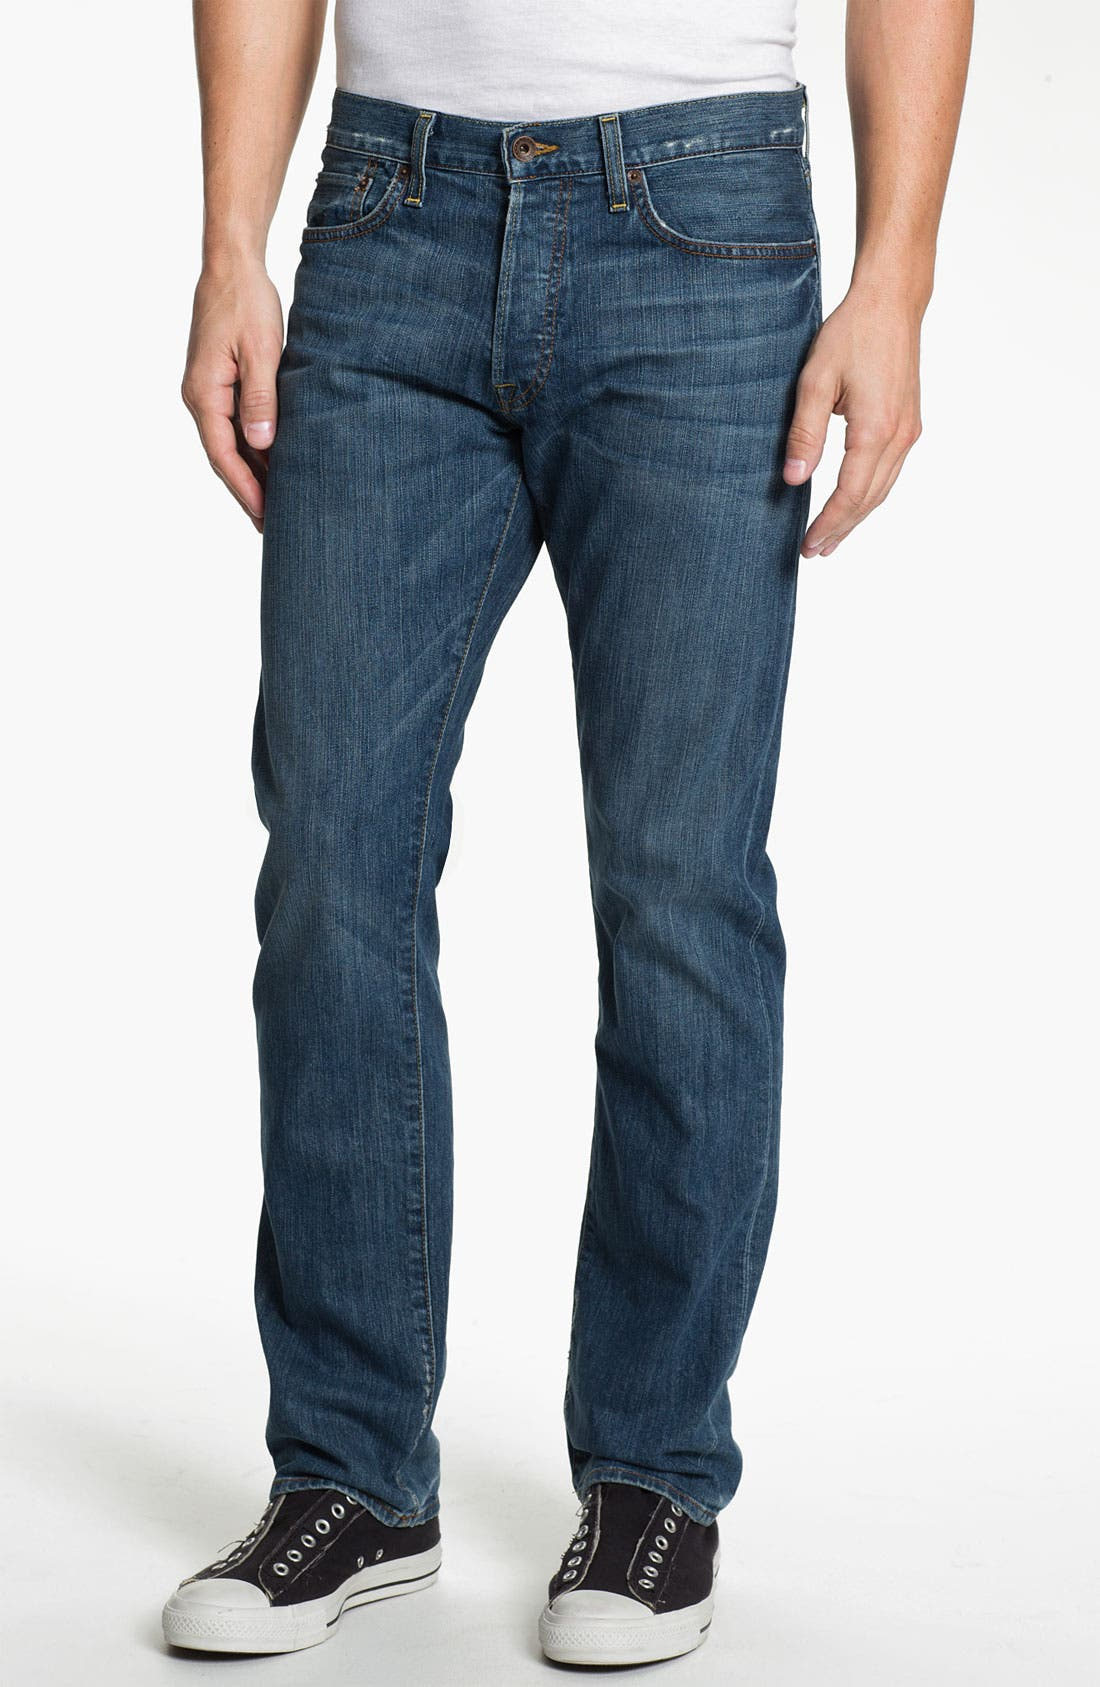 Alternate Image 1 Selected - Lucky Brand '121 Heritage' Slim Straight Leg Jeans (Ol' Vicksburg)